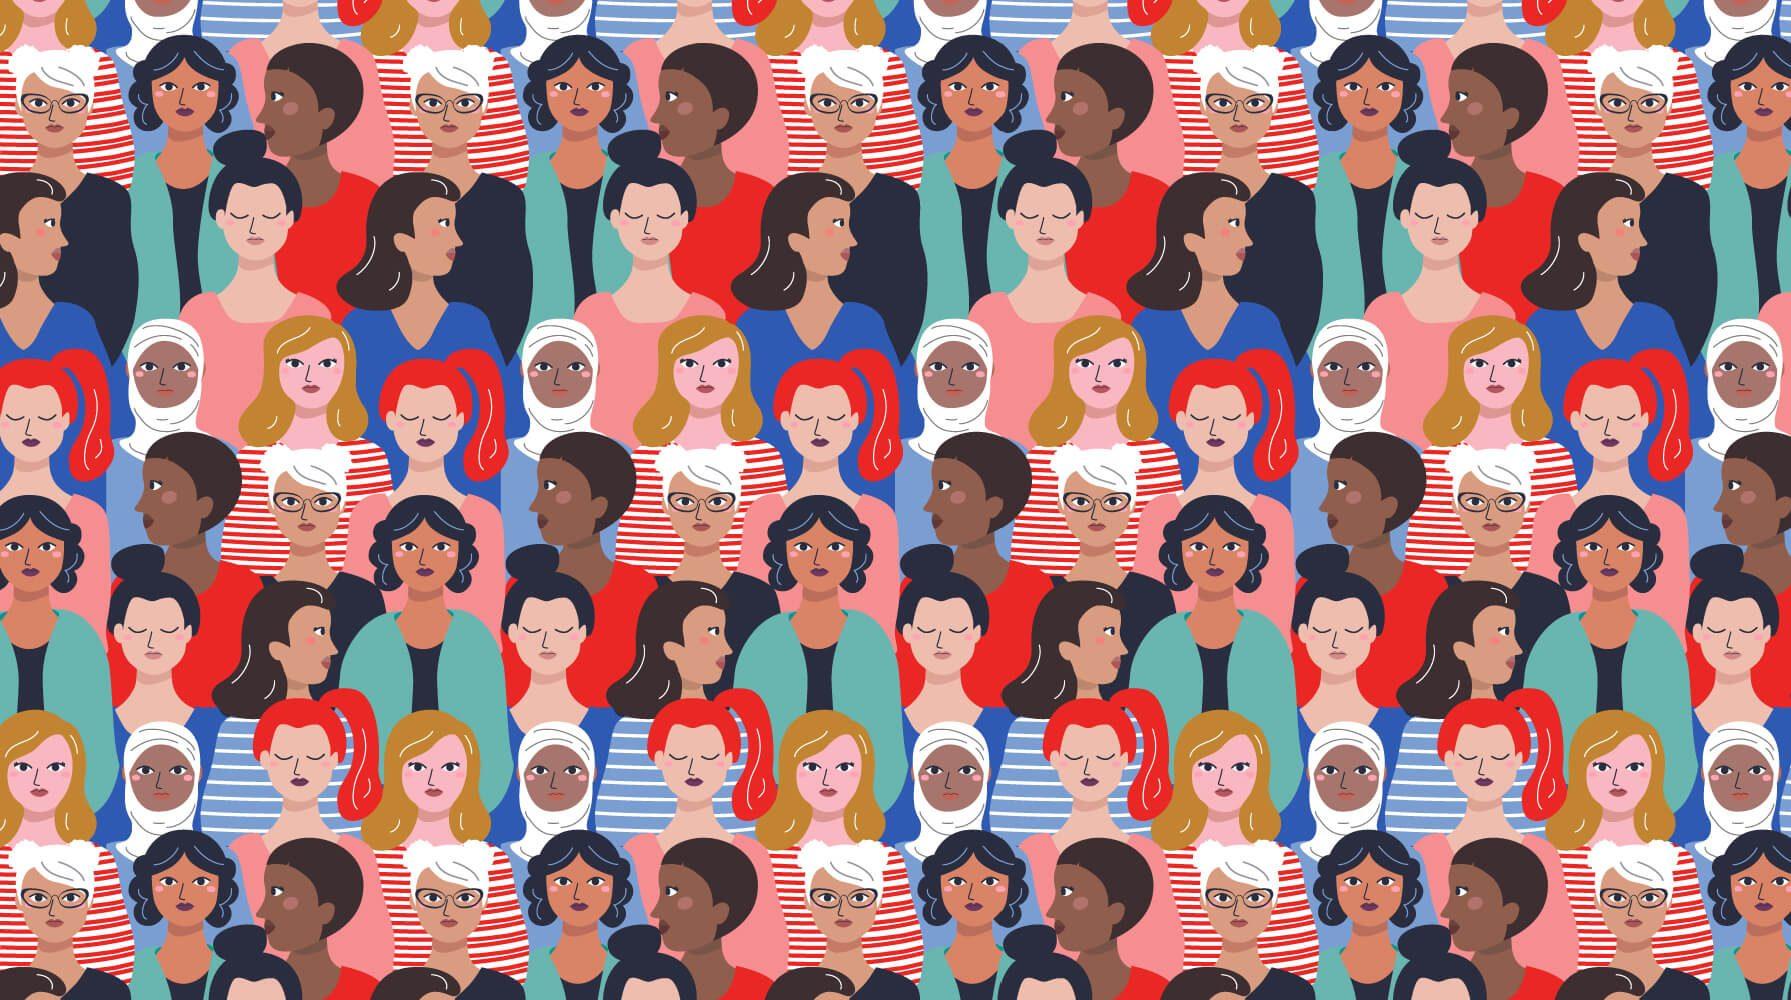 Gender Equality, The World Survey